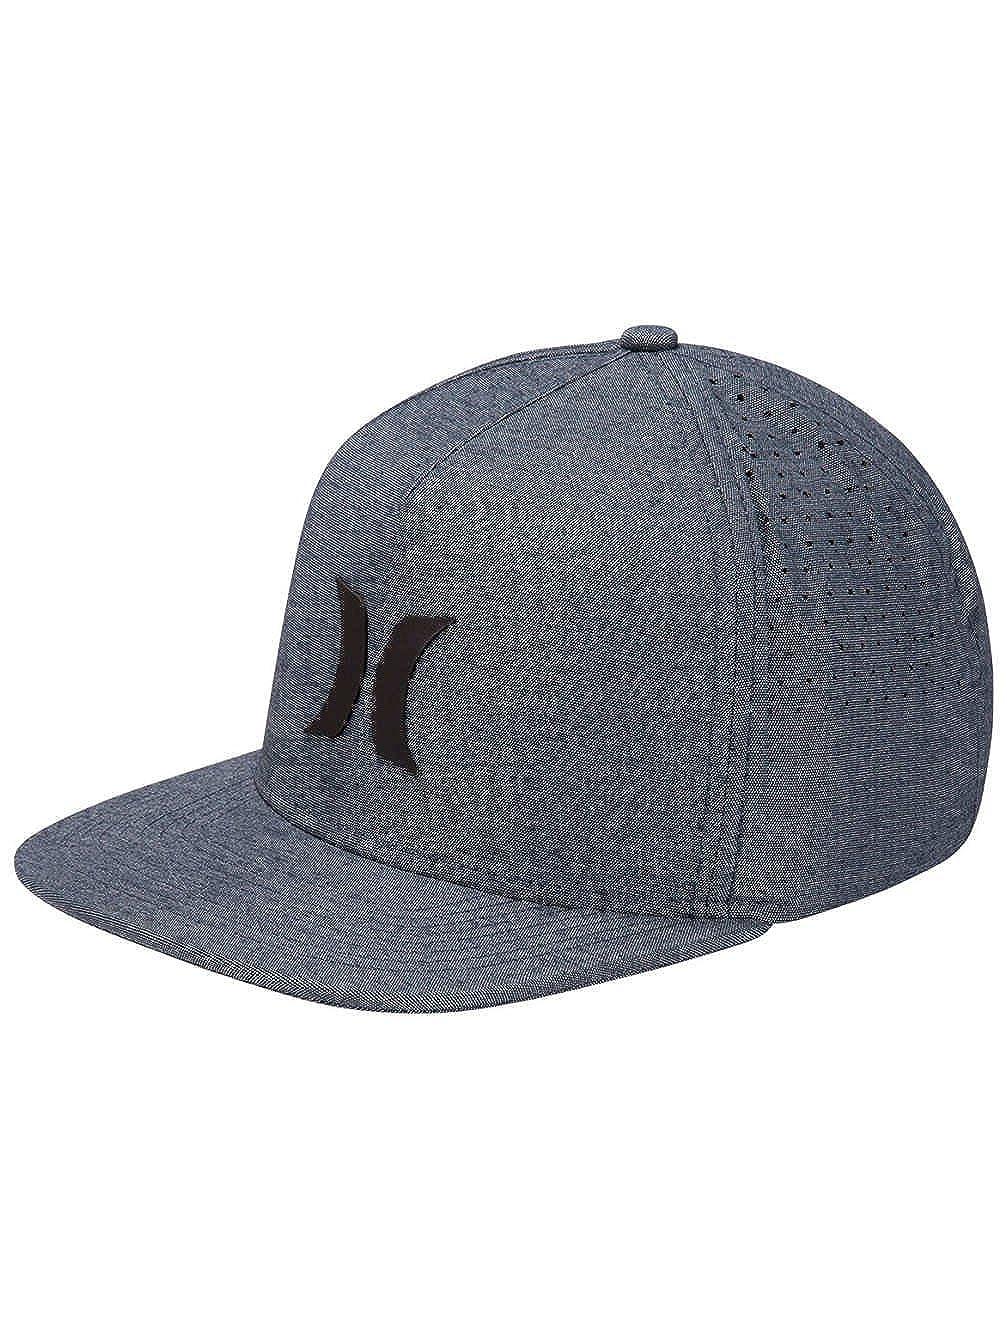 eb7d54282ad4c Amazon.com  Hurley Men s Dri-Fit Icon 4.0 Hat  Clothing